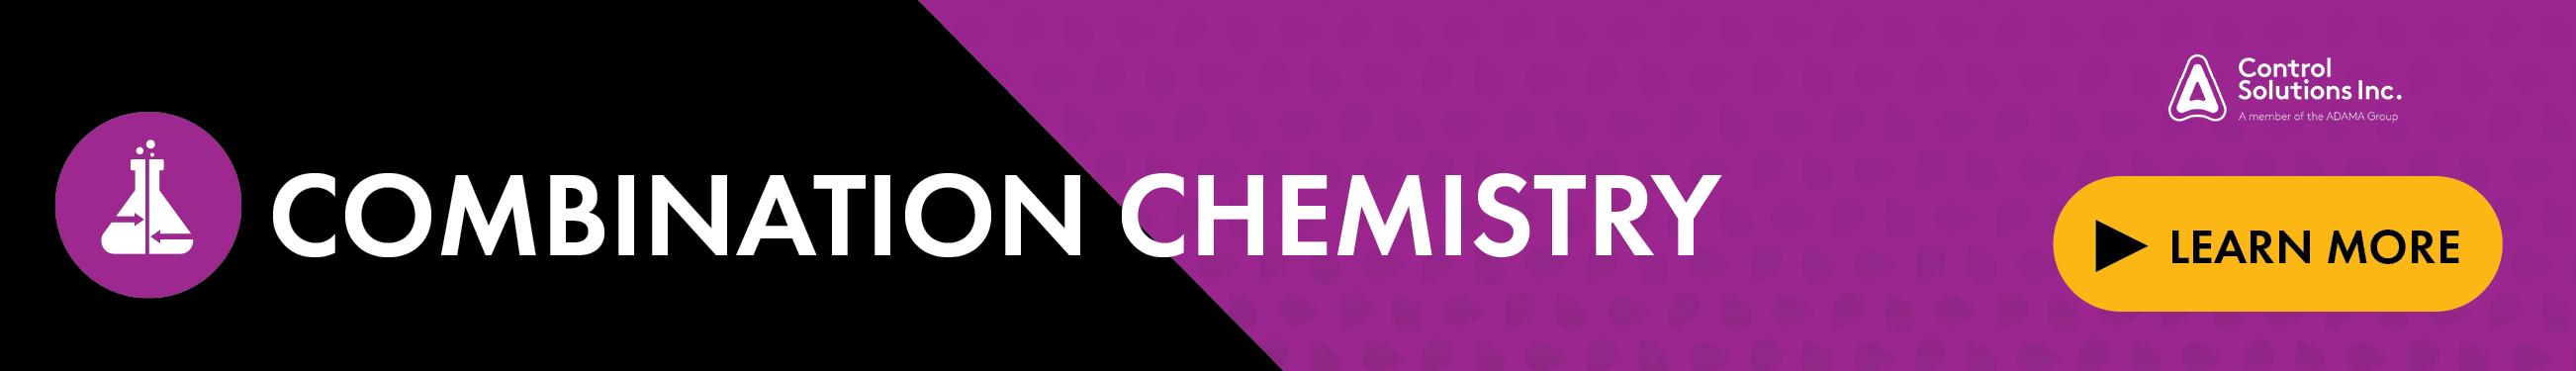 Combination chemistry CTA-restaurant-wars